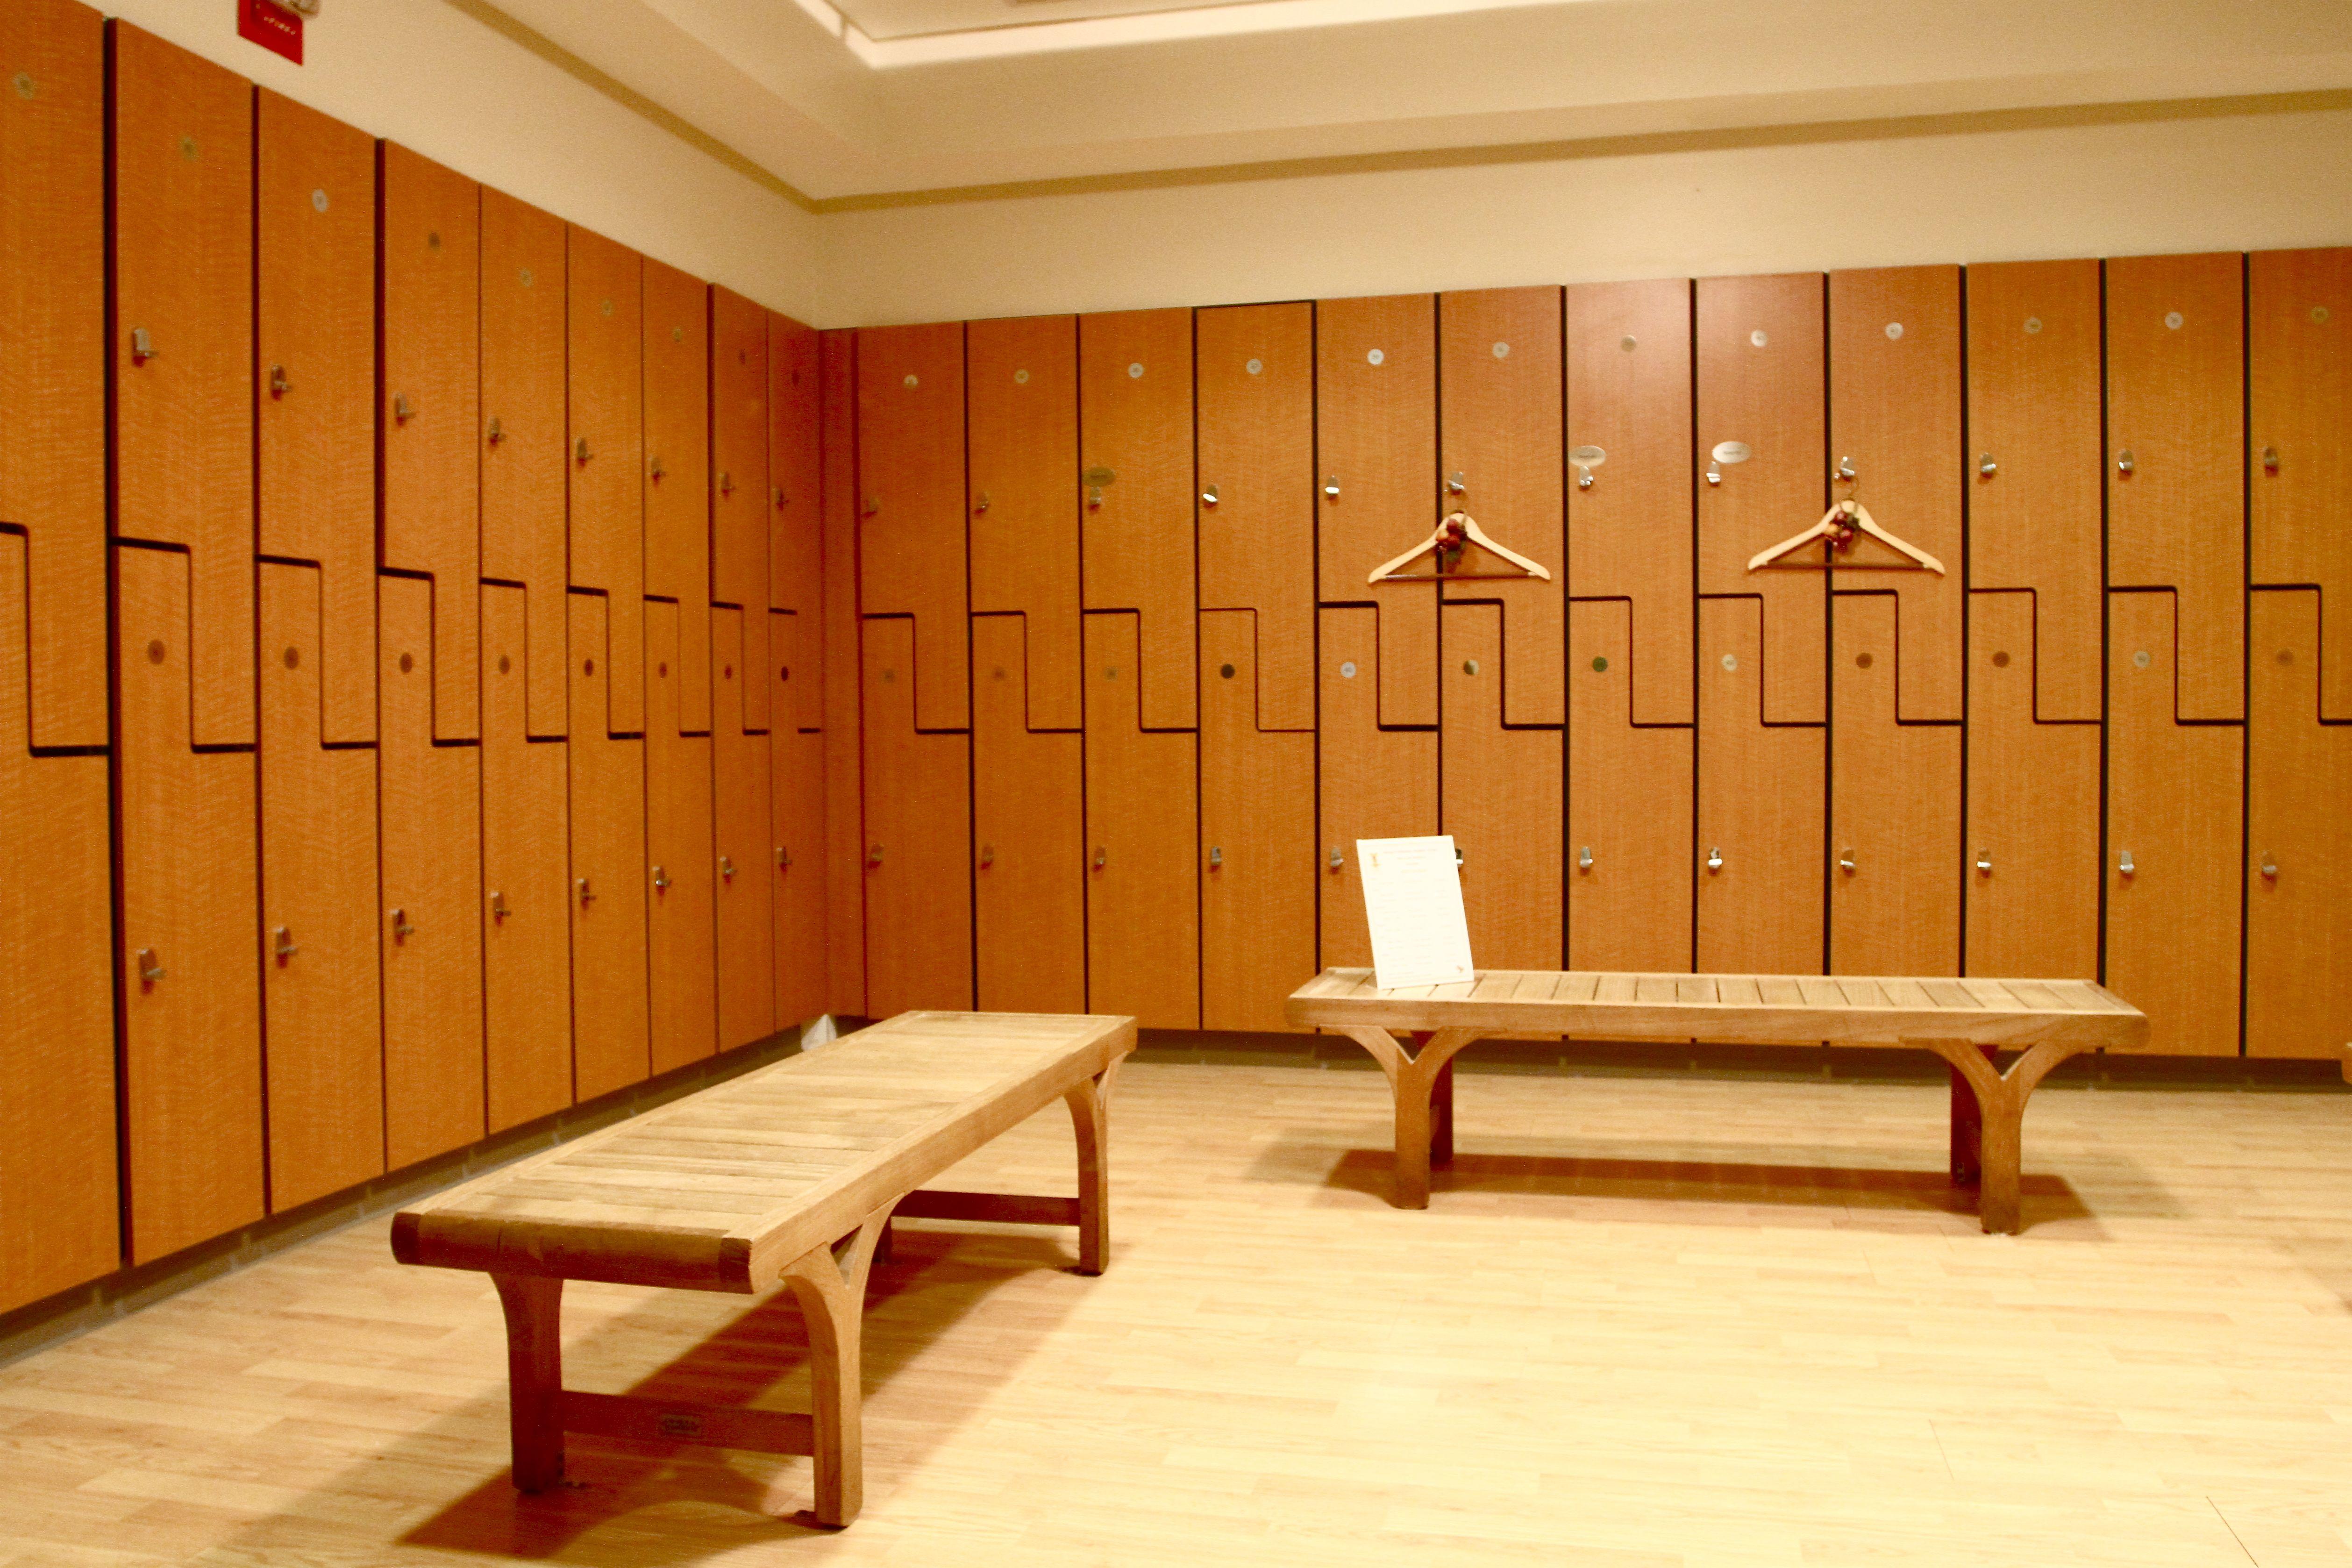 Spectacular Gym Locker Room Design | Chesapeake | Pinterest | Gym ...